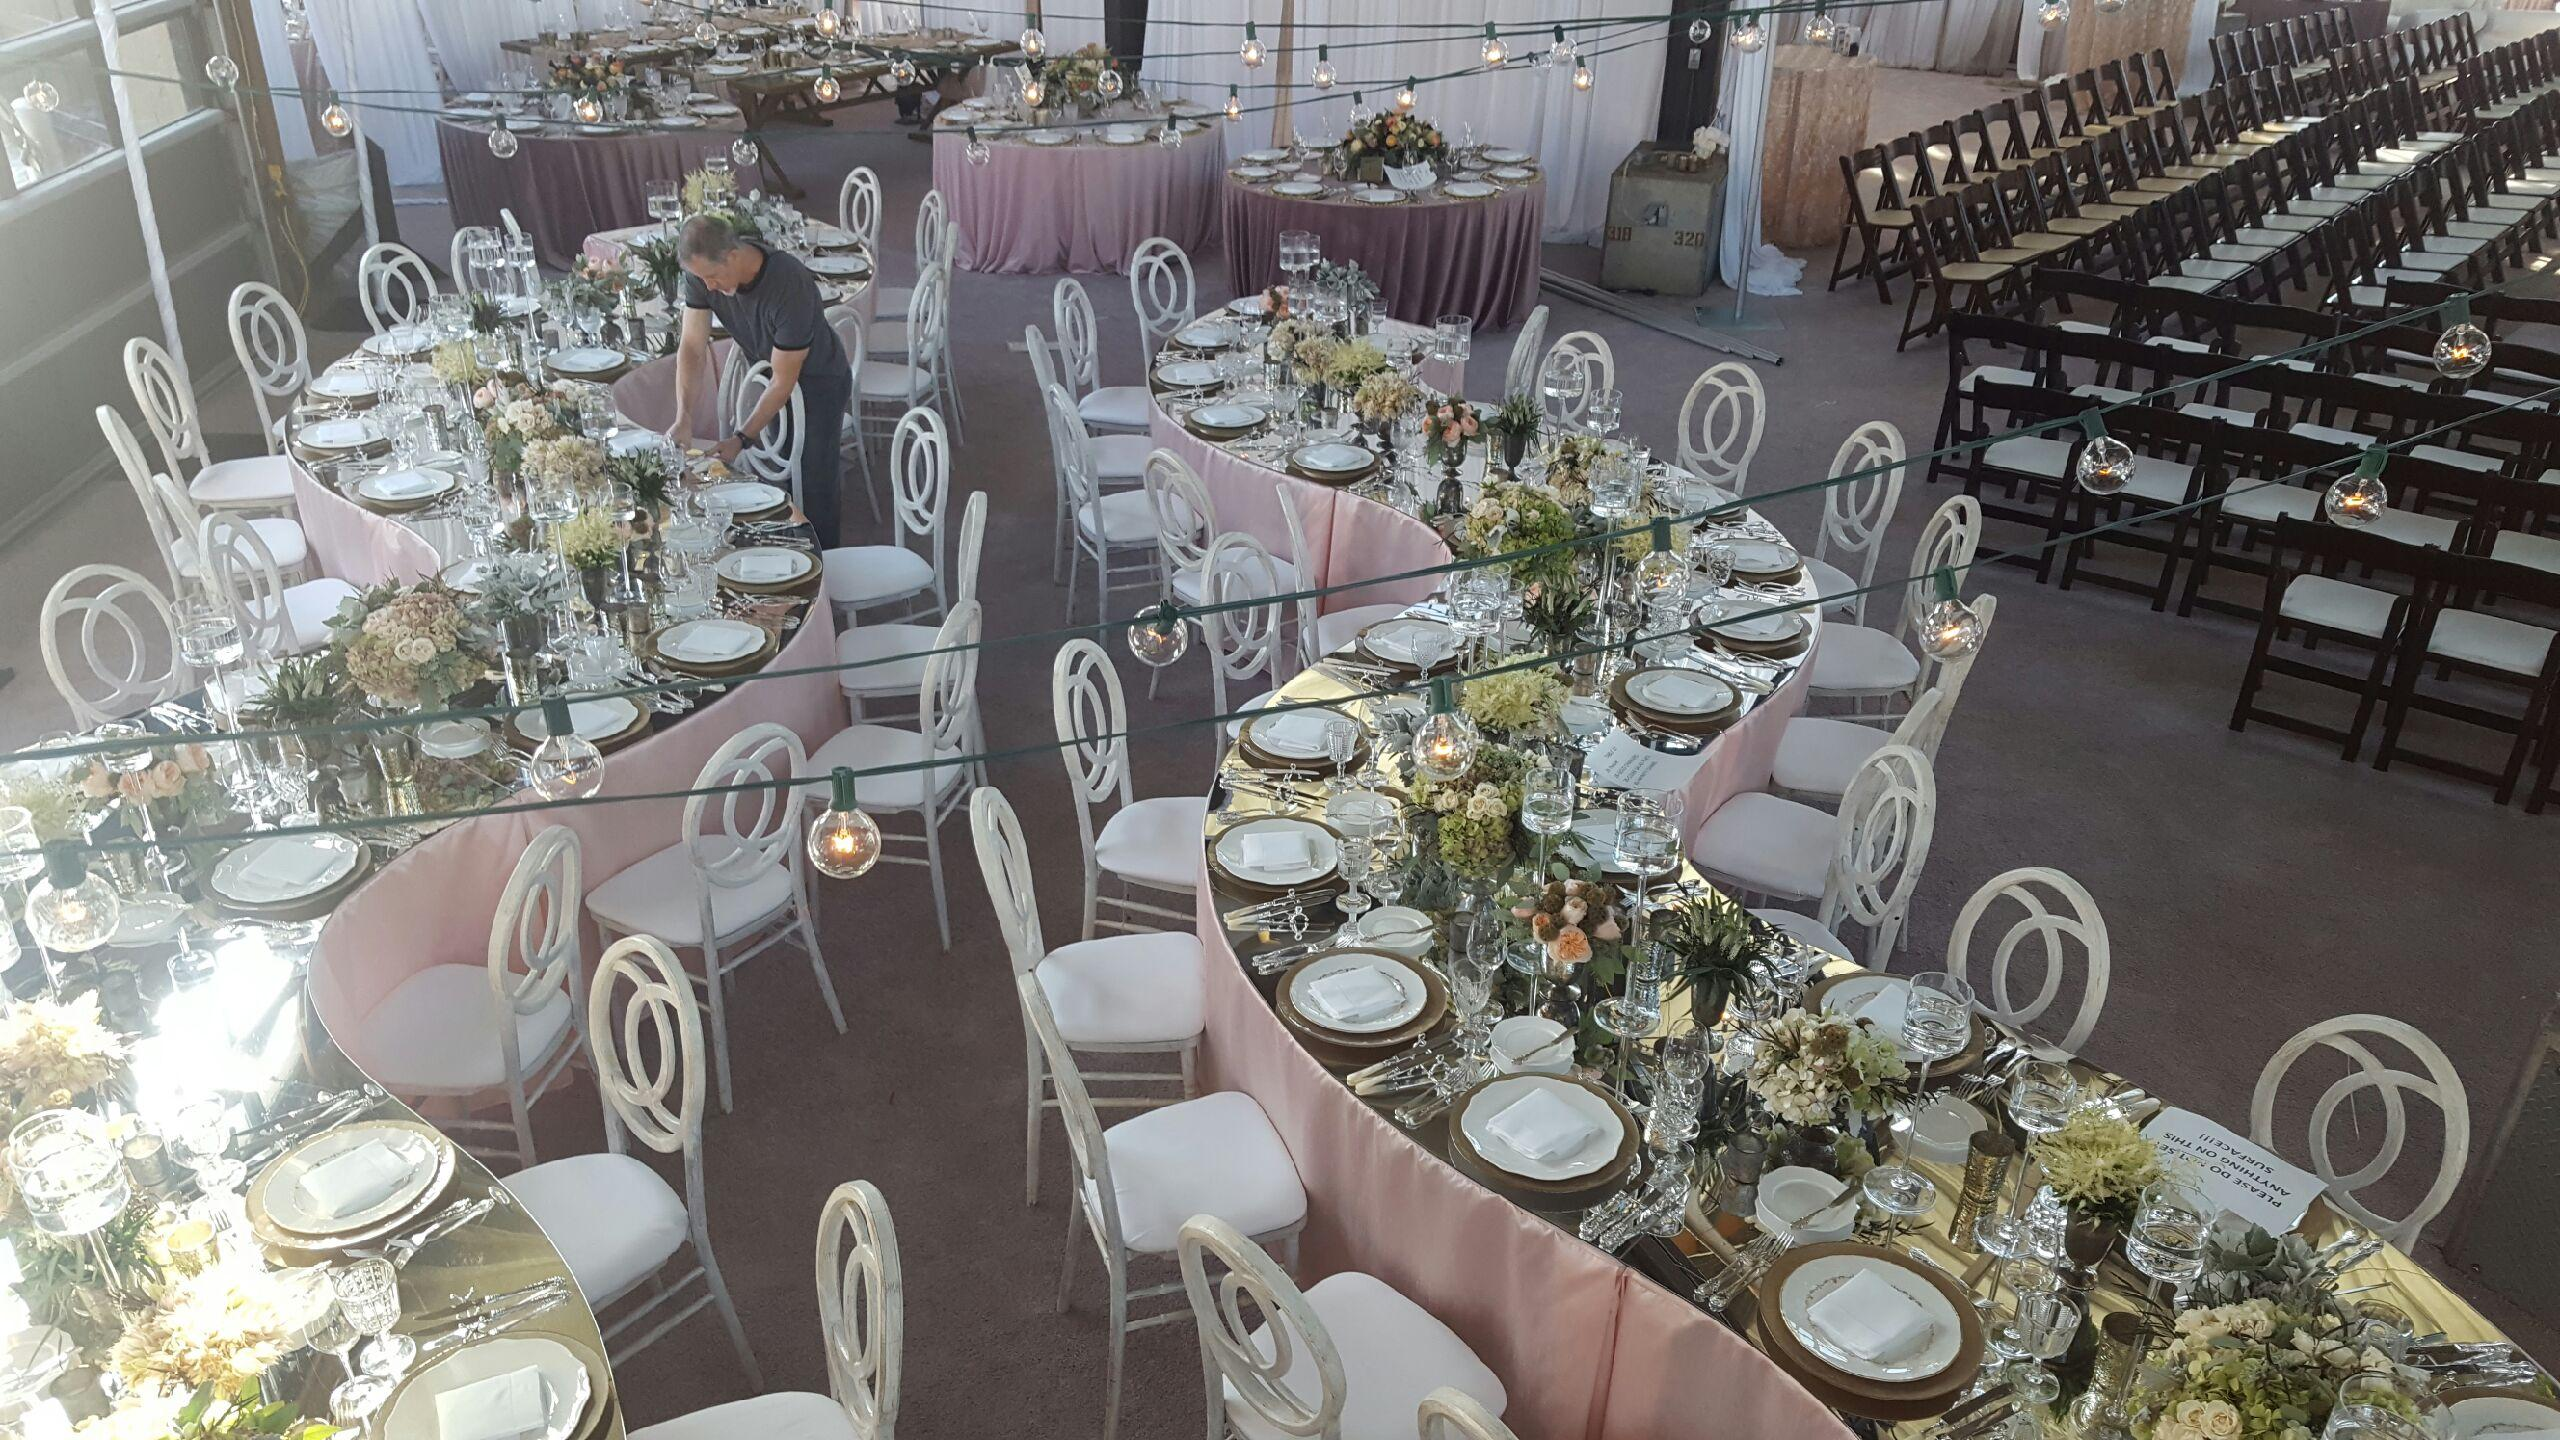 Acrylic Mirrored Table Toppers  Rochester MI  Pruett